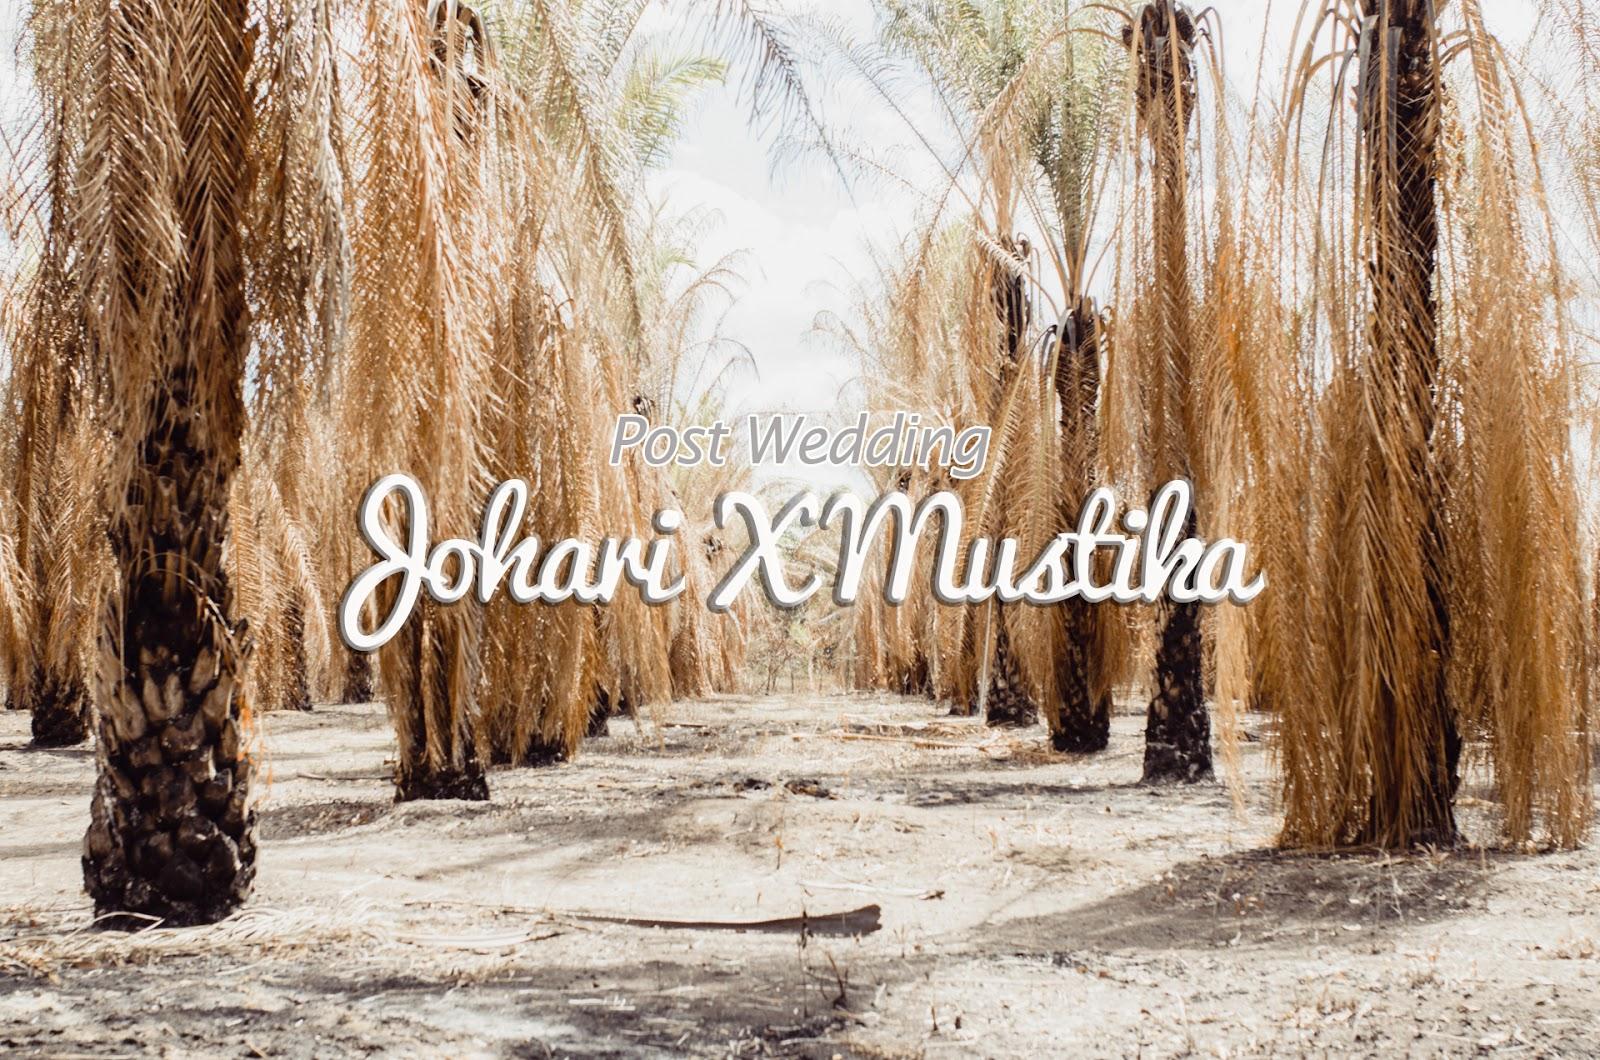 Johari + Mustika